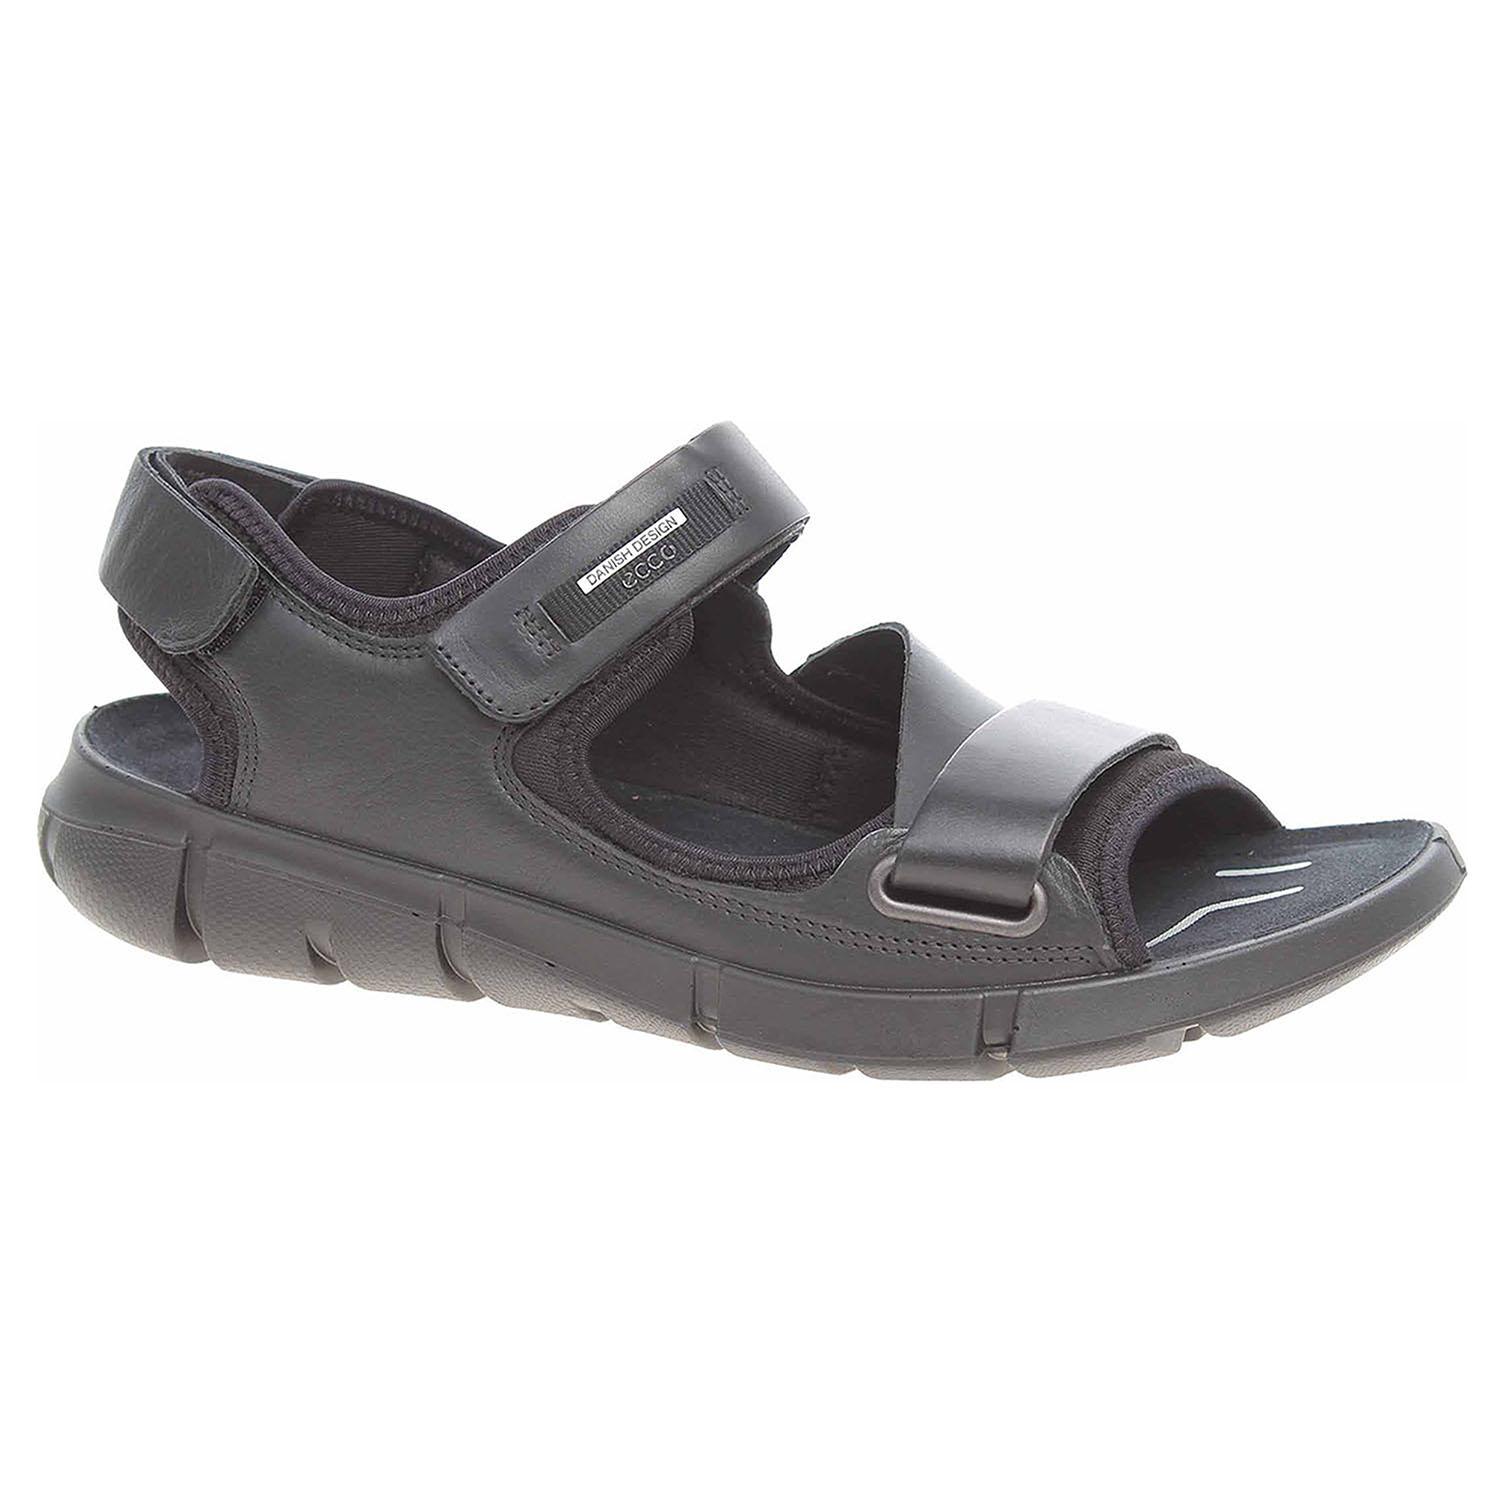 32a159b7bd32 Ecco Pánské sandály Ecco Intrinsic Sandal 84205451052 black-black 24700266